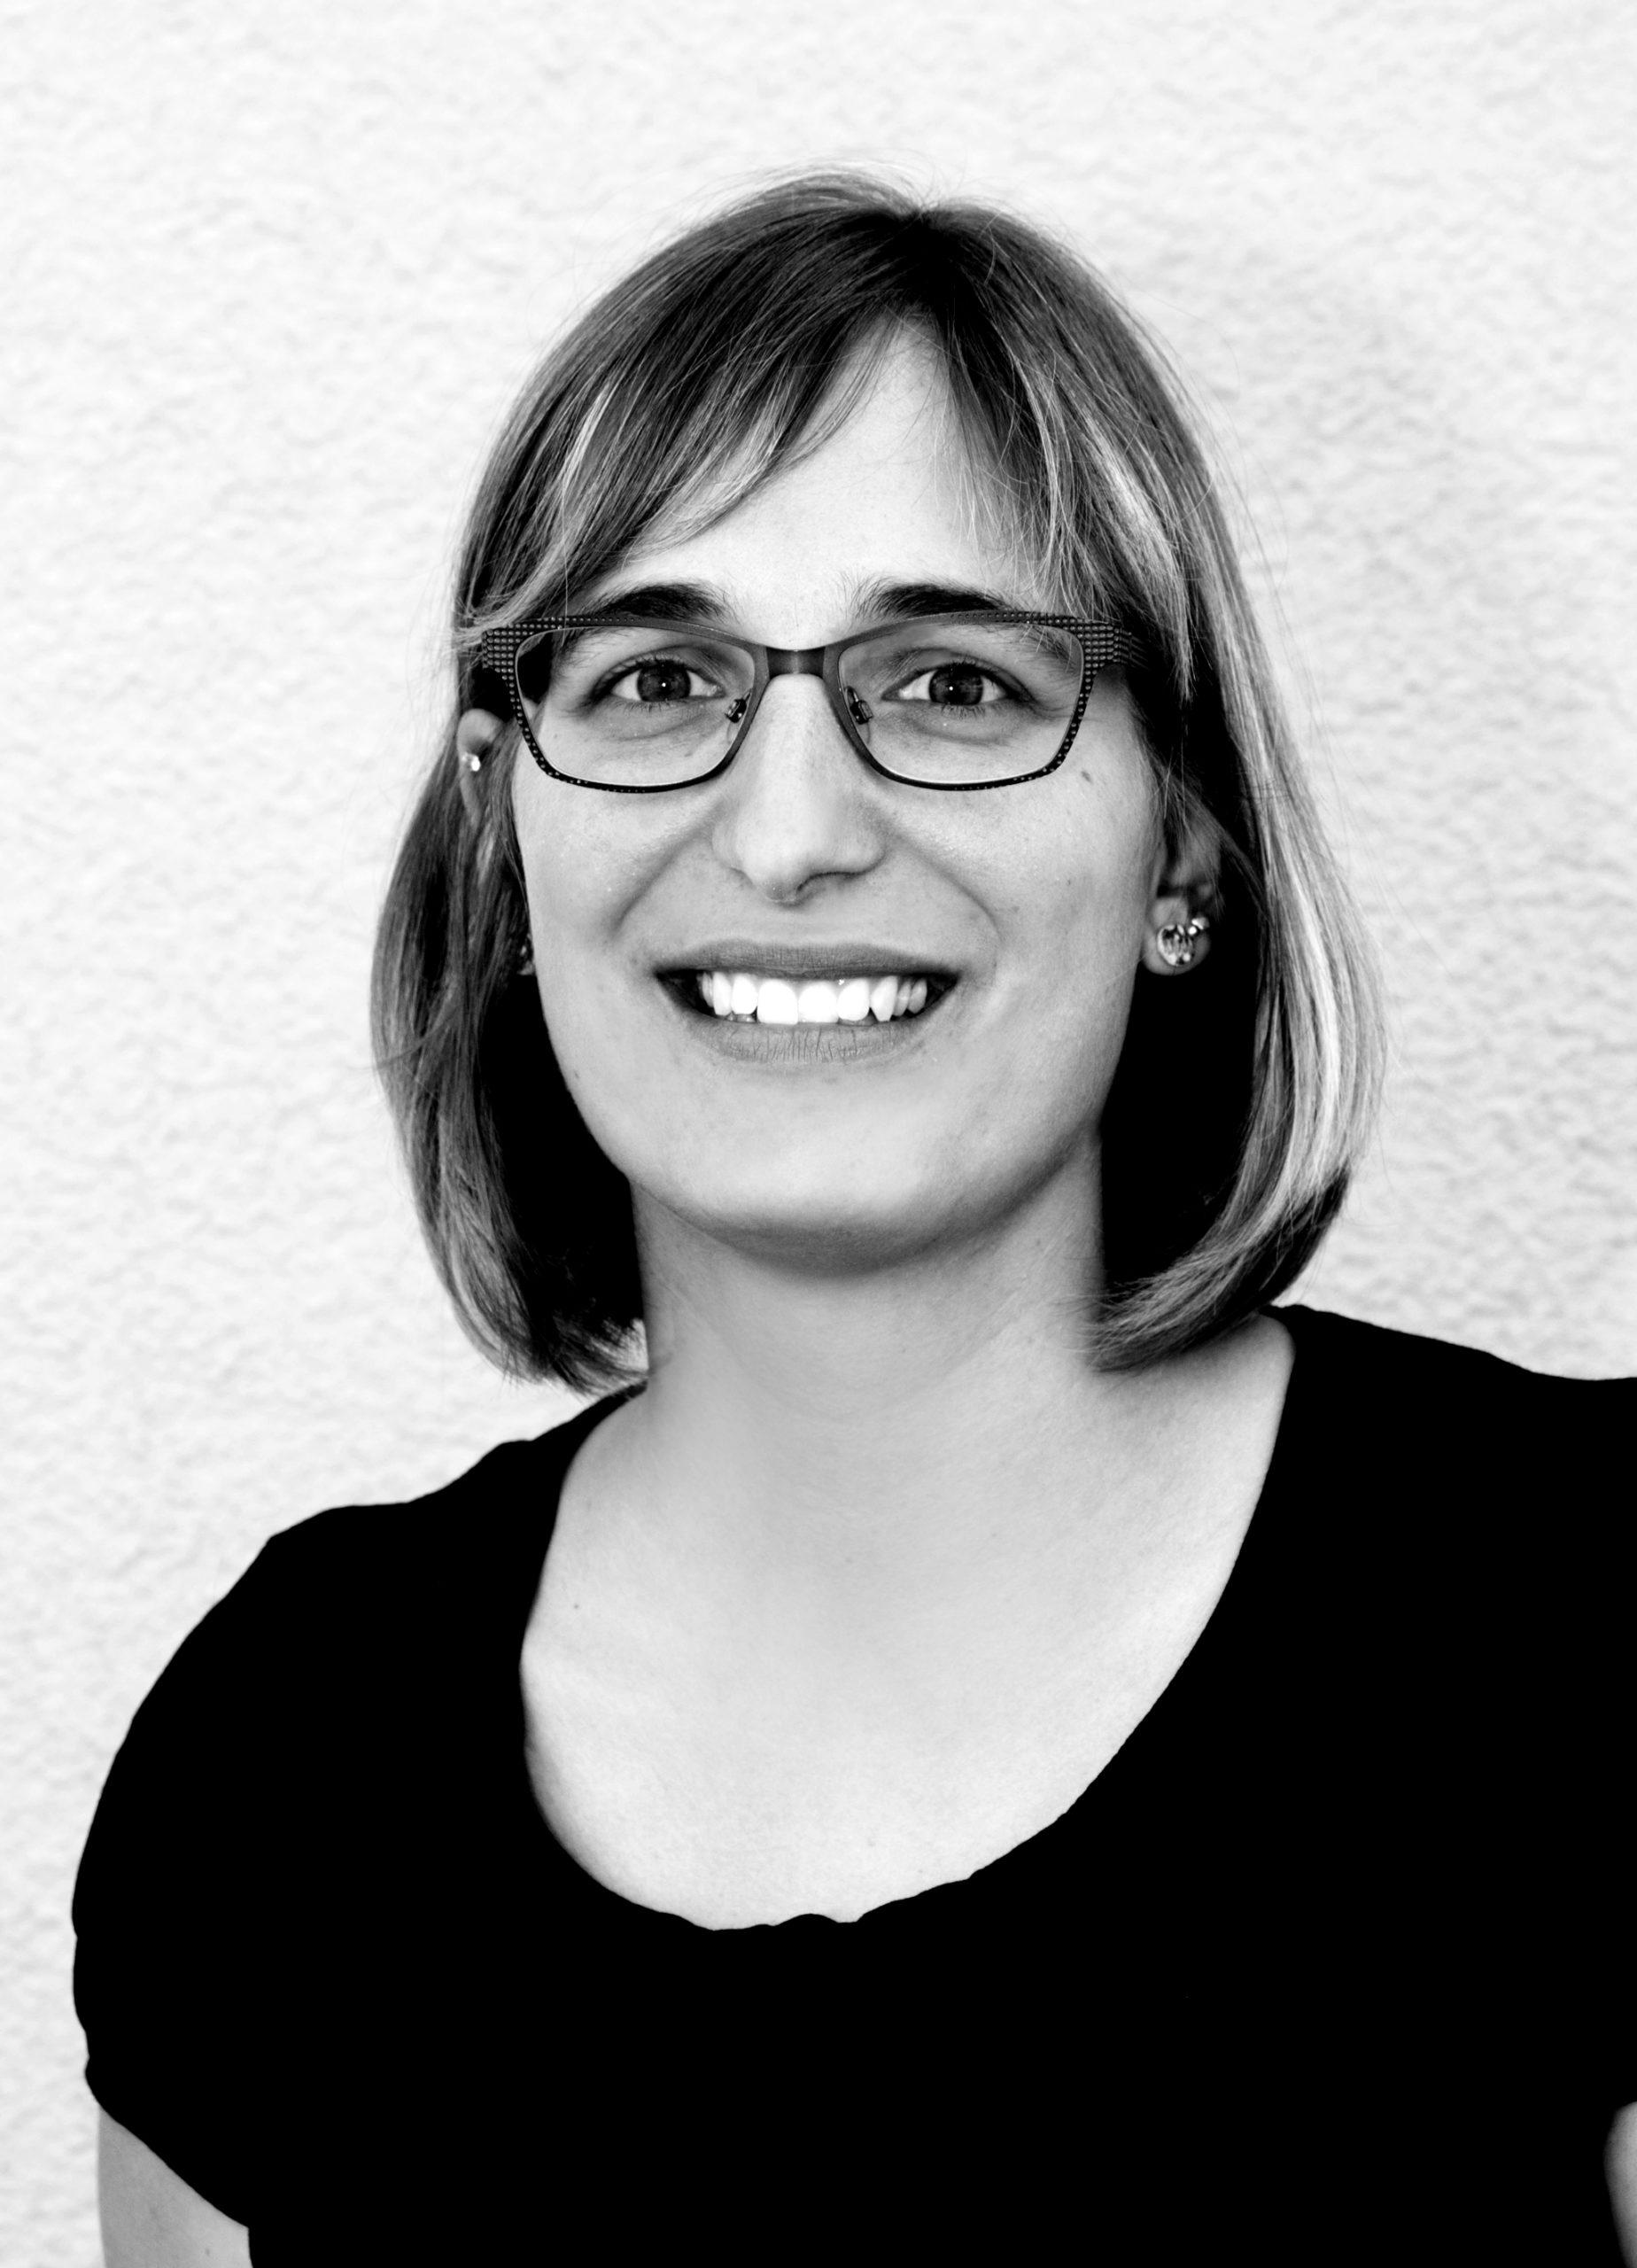 Sabine Kerschner